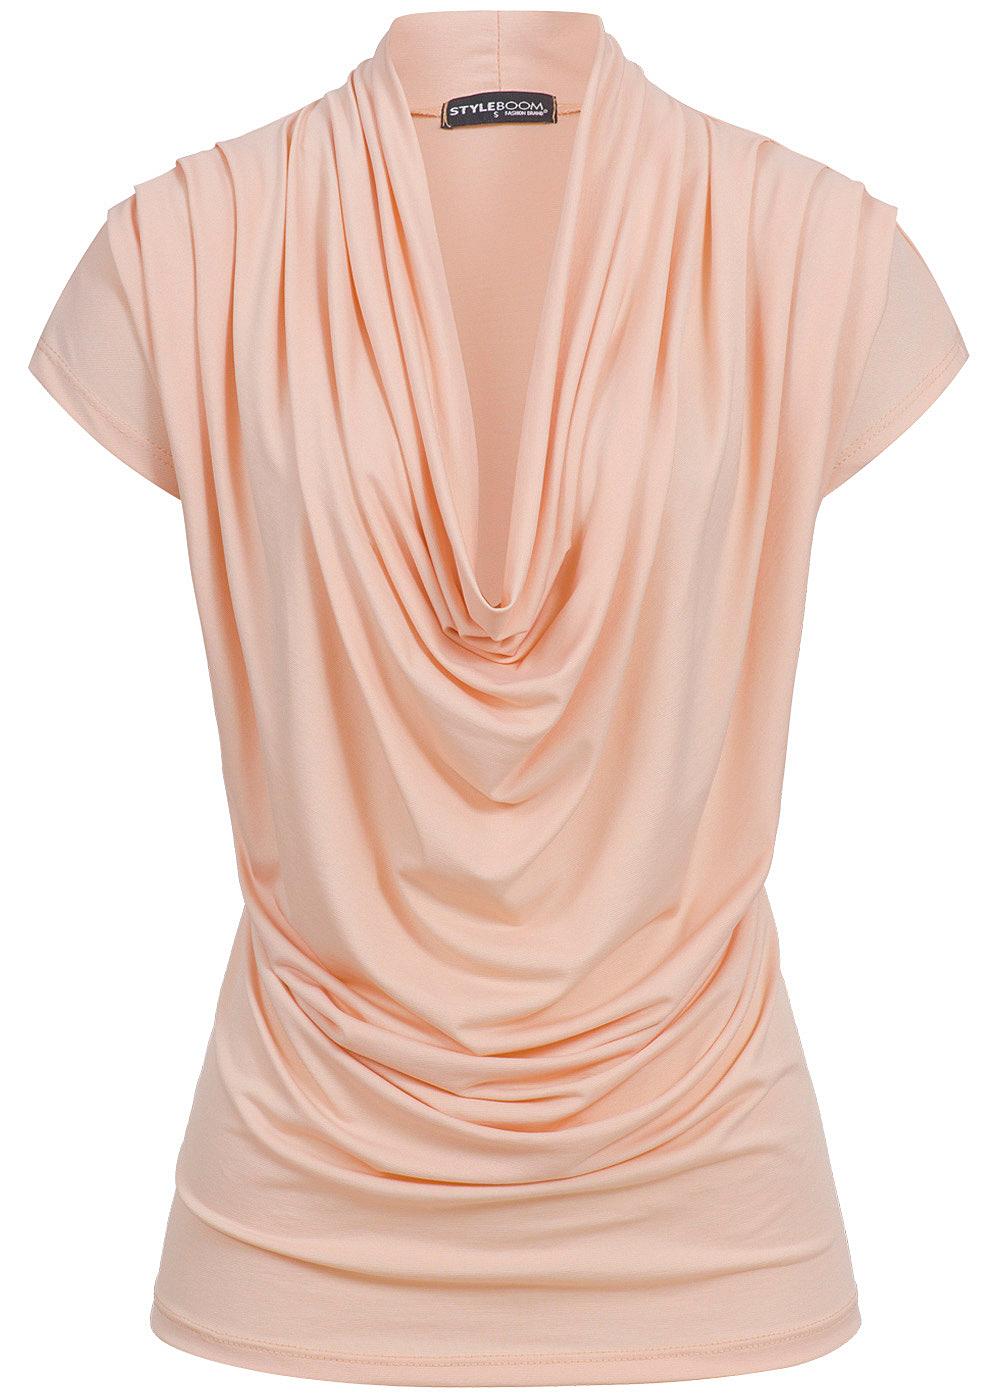 styleboom fashion damen top rosa 77onlineshop. Black Bedroom Furniture Sets. Home Design Ideas